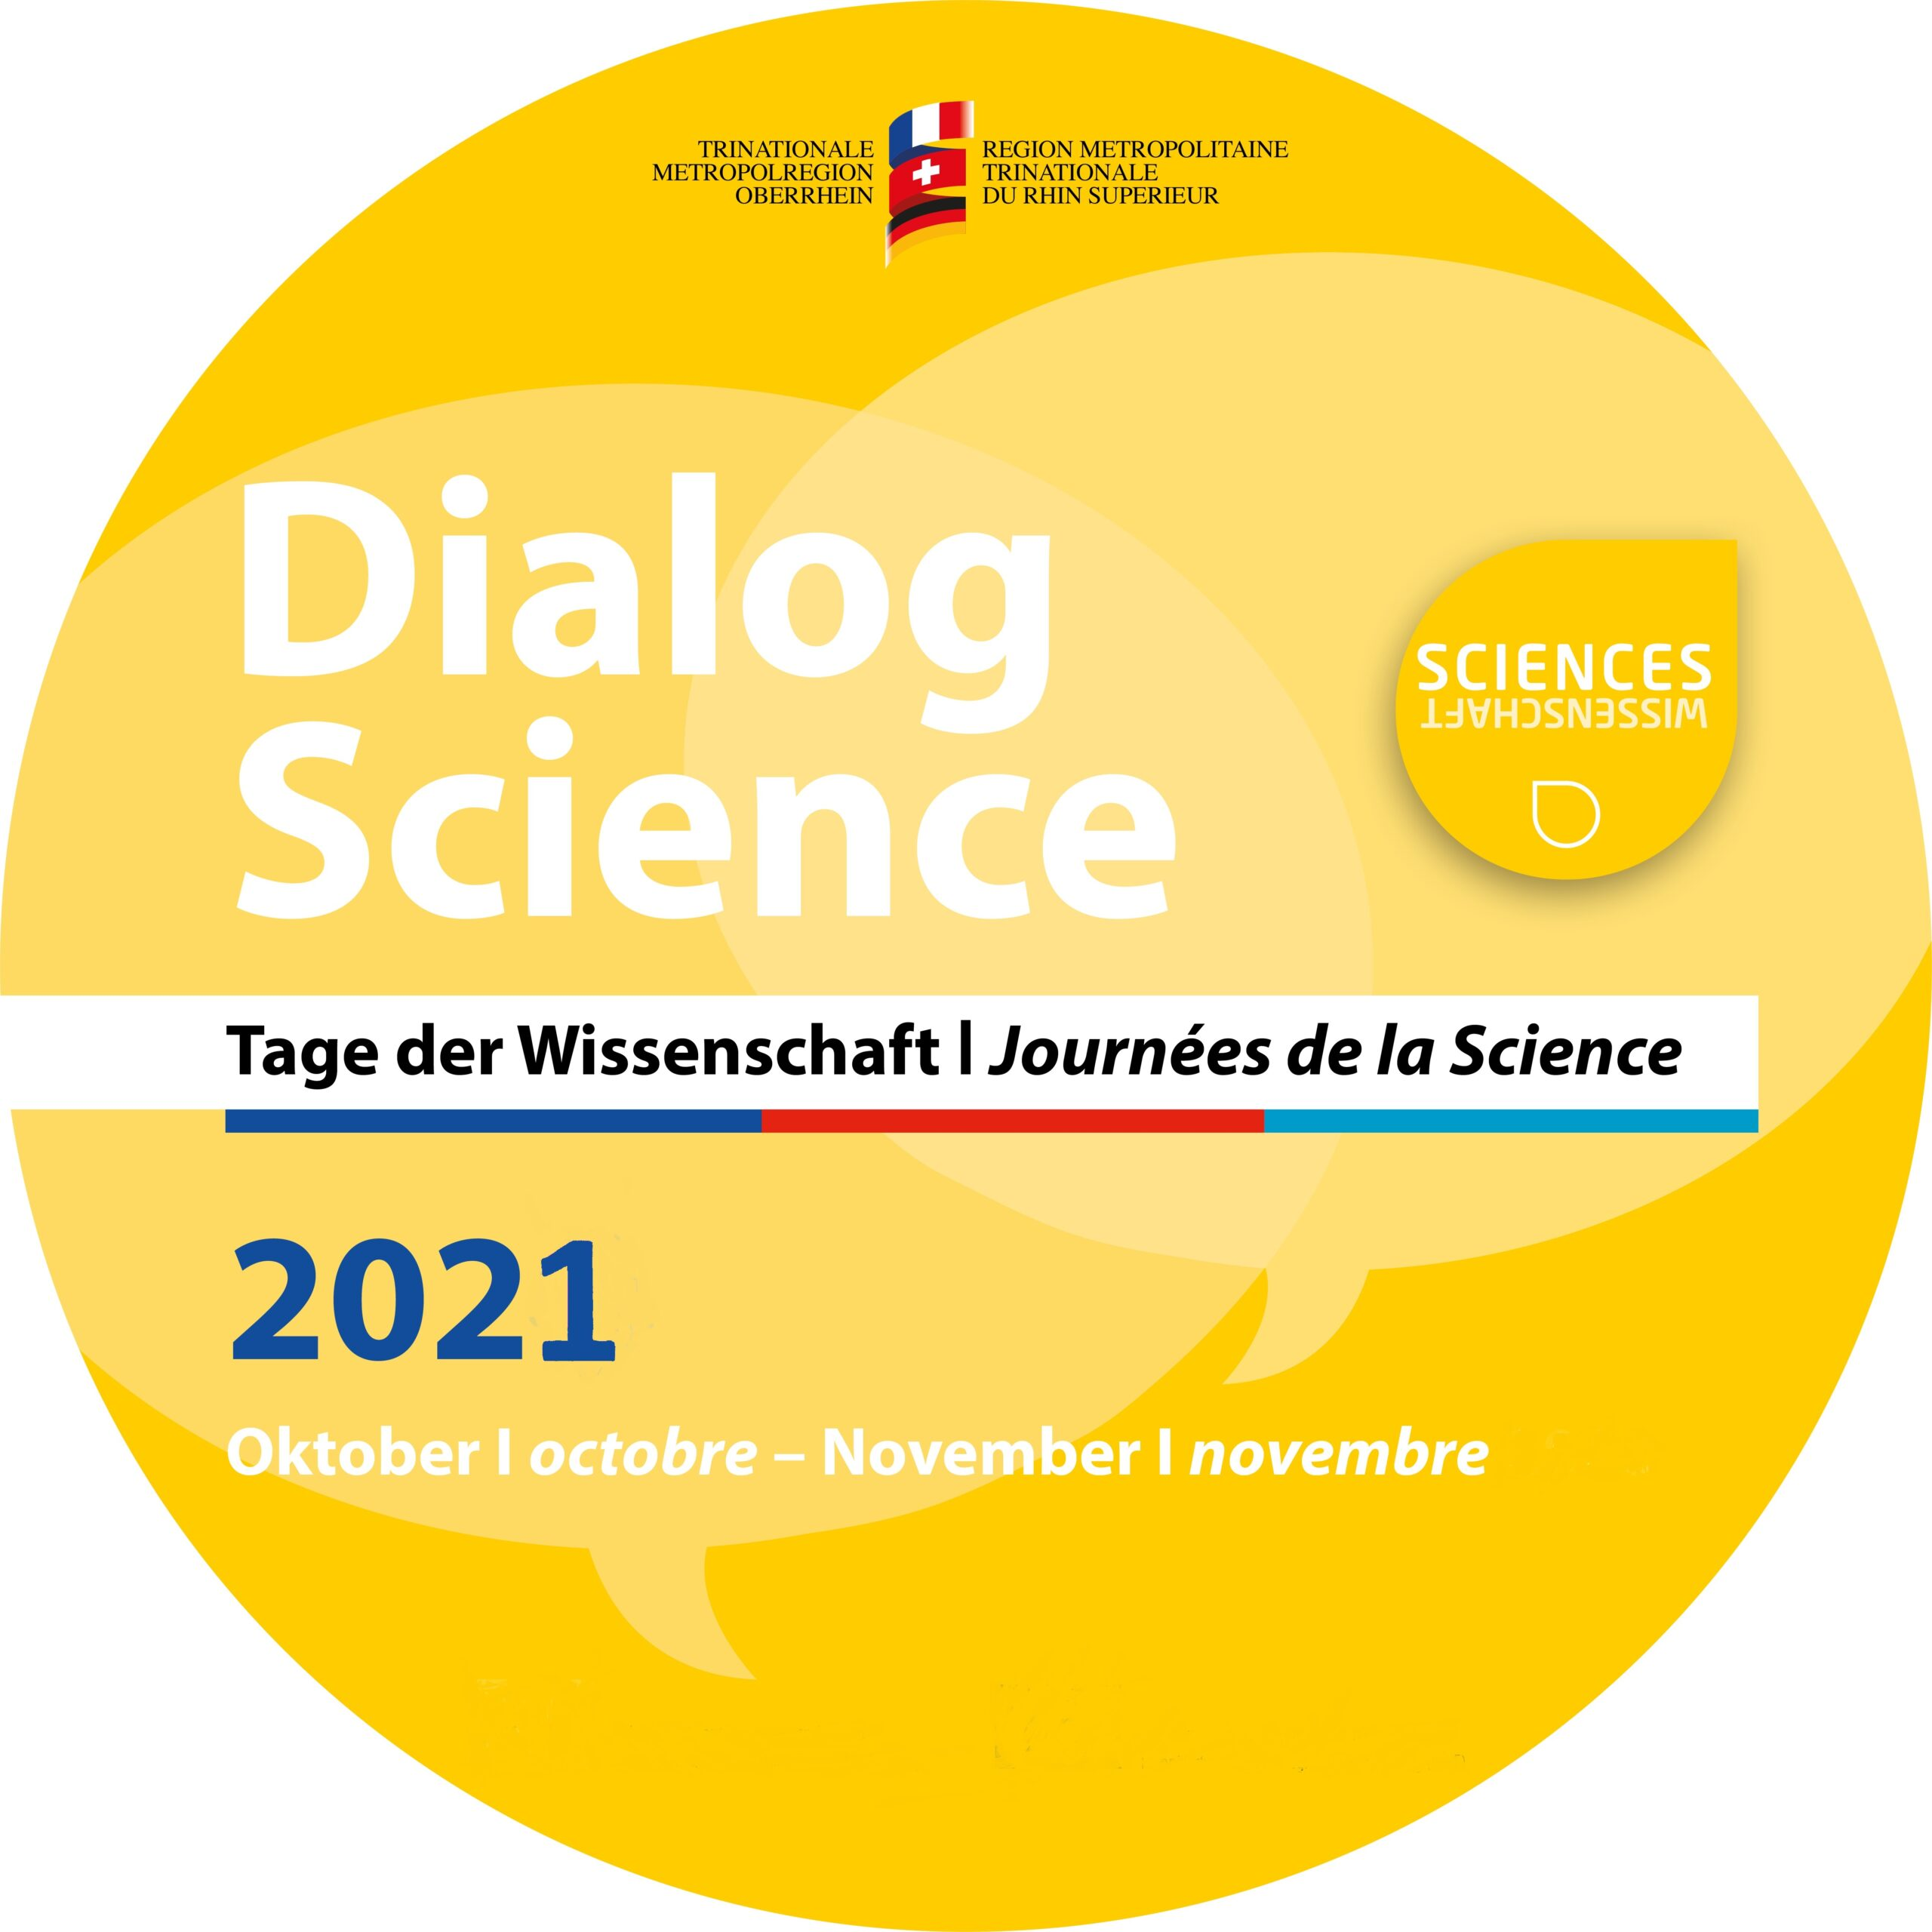 5749_TMO_Dialog-Science_Twitter_rund_2021-scaled.jpg